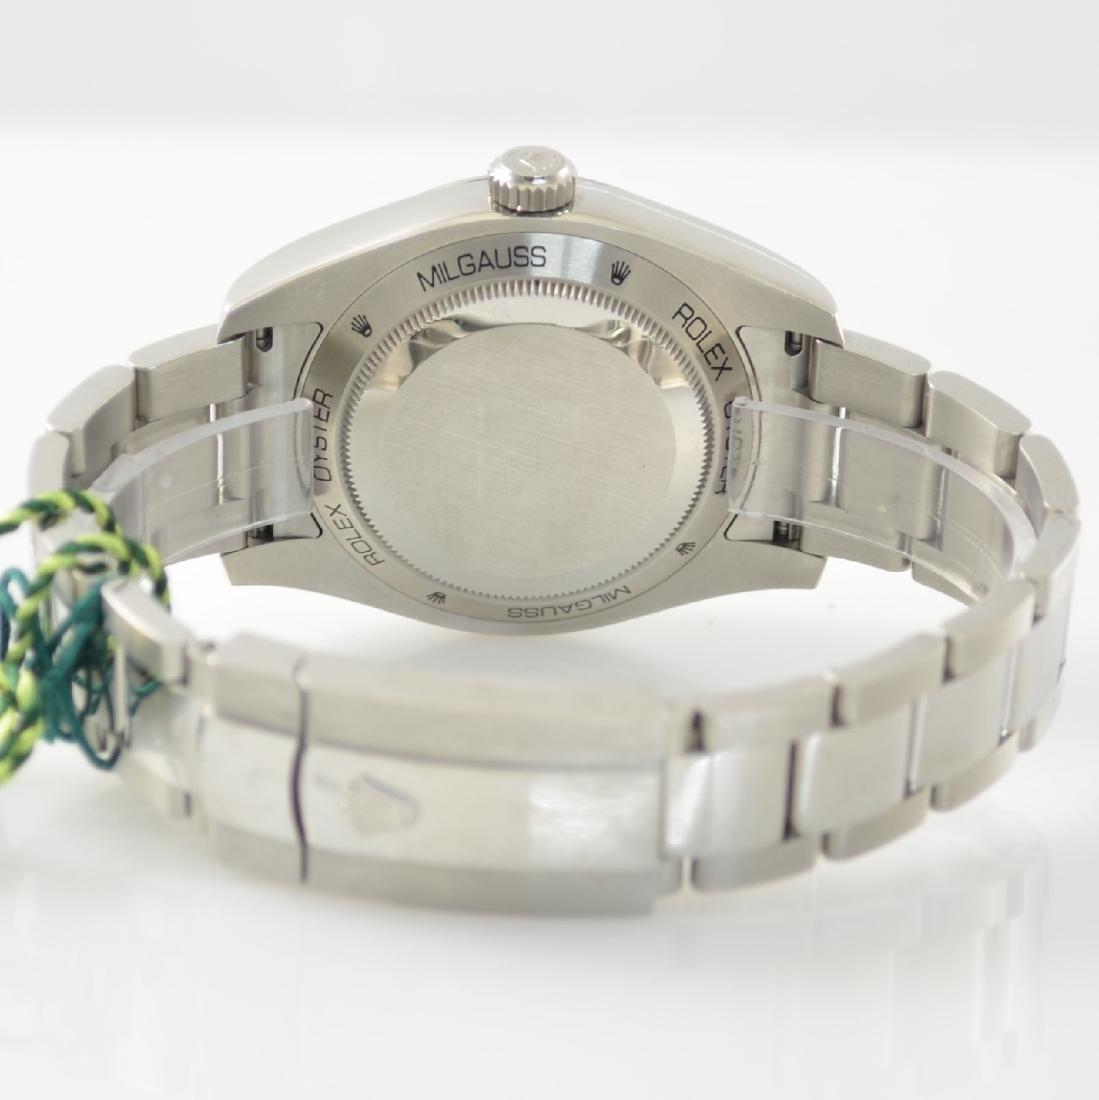 ROLEX wristwatch Oyster Perpetual Milgauss 116400GV - 6